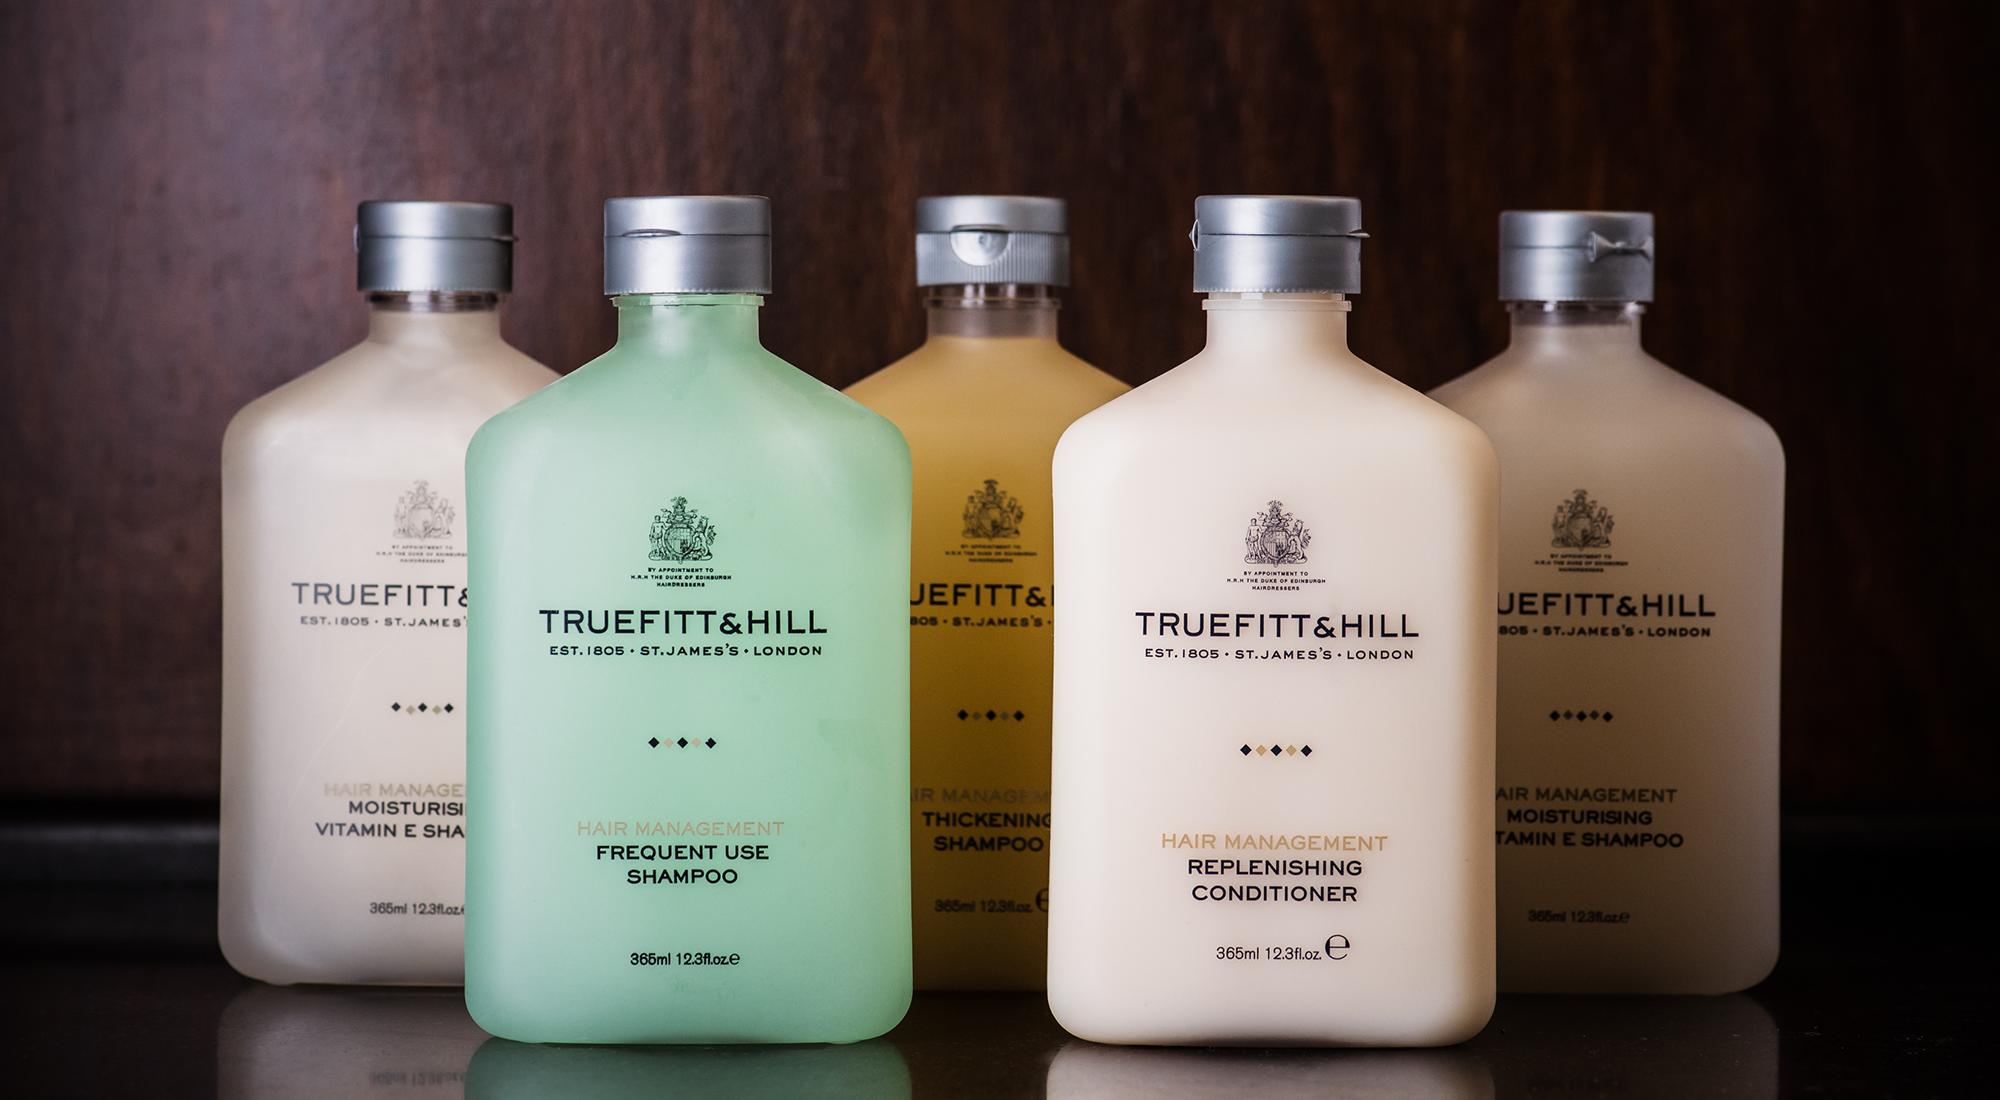 Save on Truefitt & Hill's luxury range of shampoo and conditioner